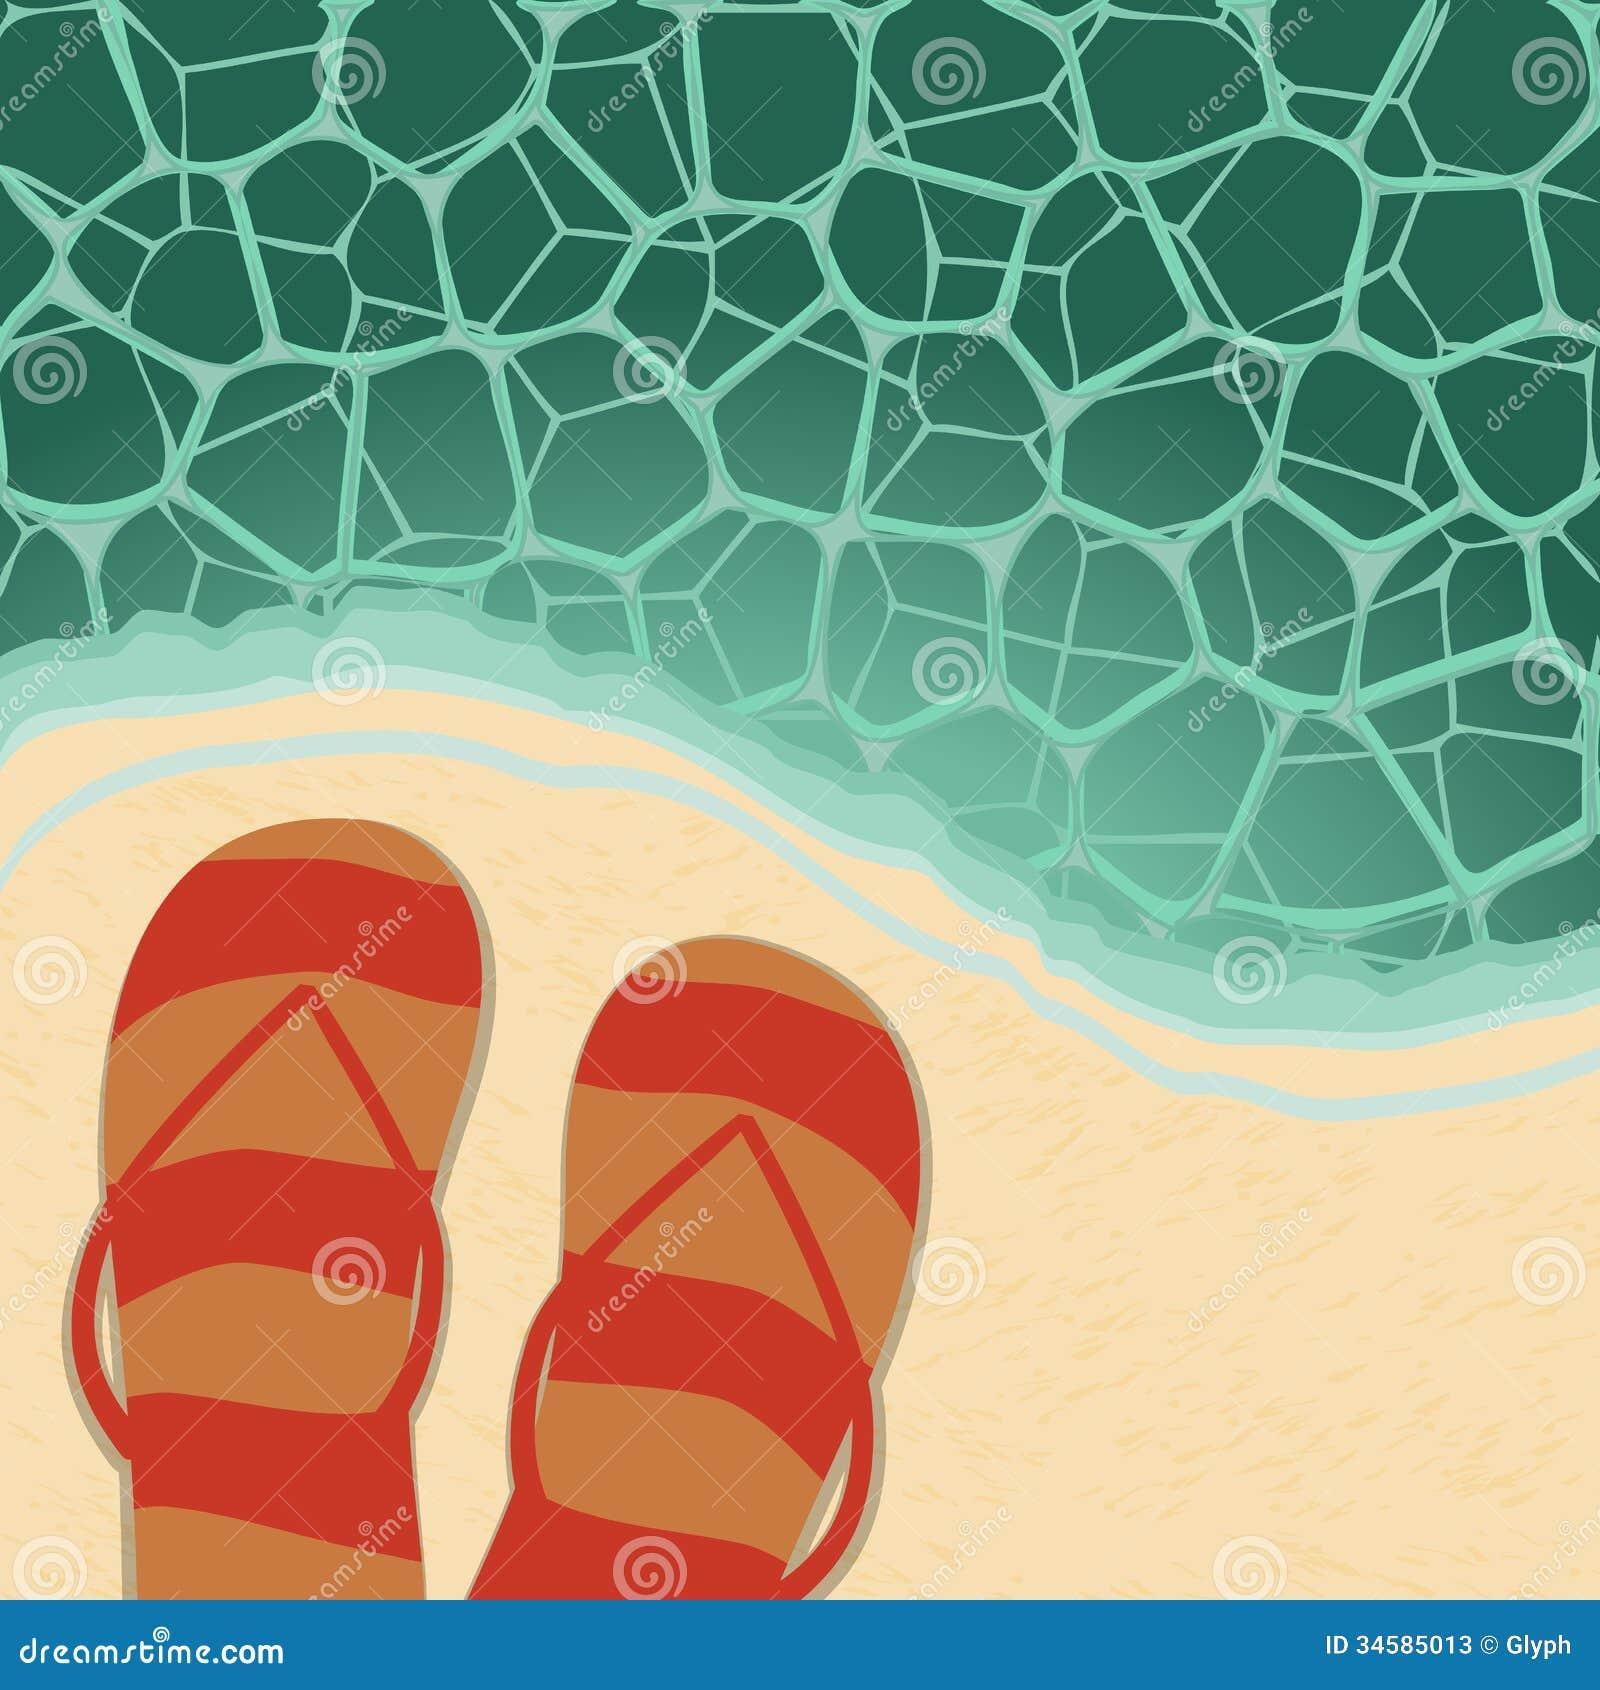 Retro Beach Illustration Stock Photos - Image: 34585013